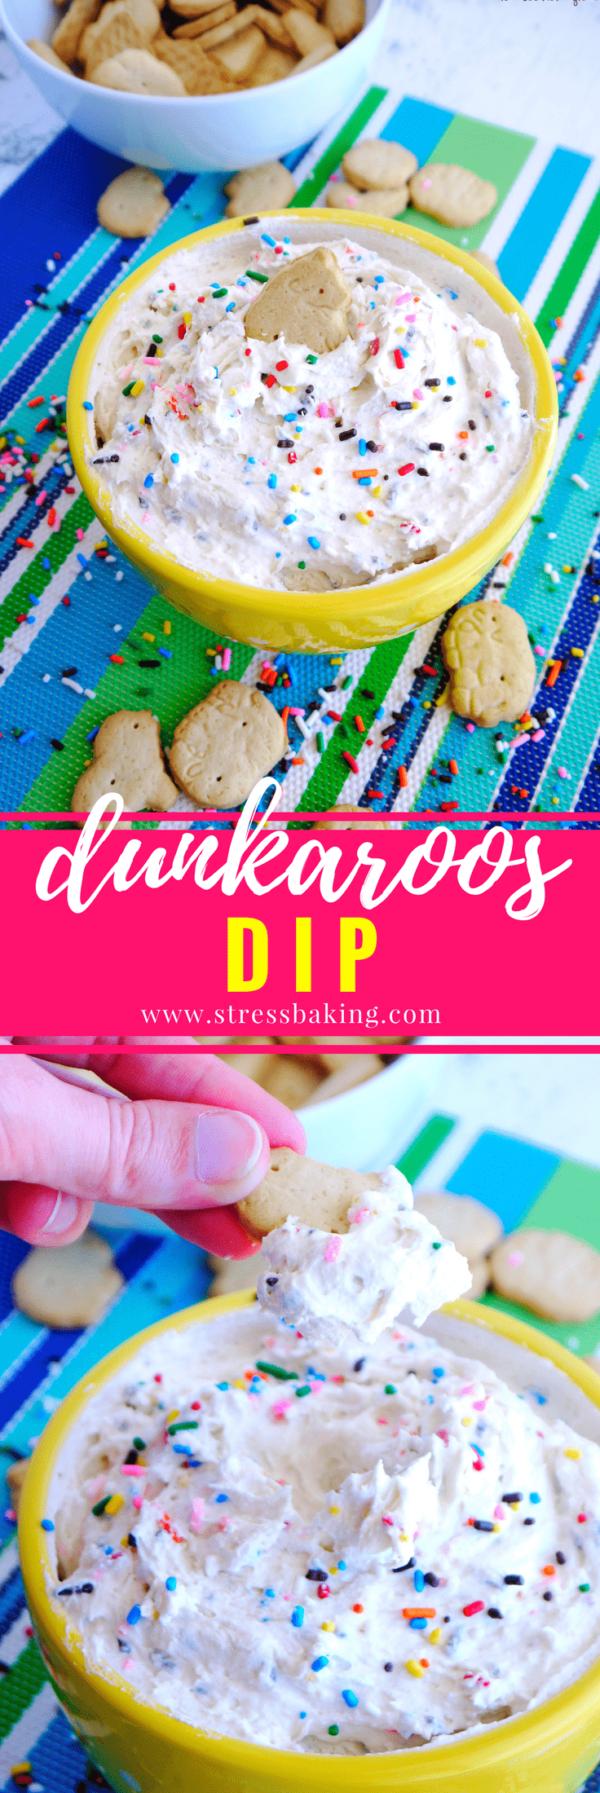 Dunkaroo Dip   Stress Baking